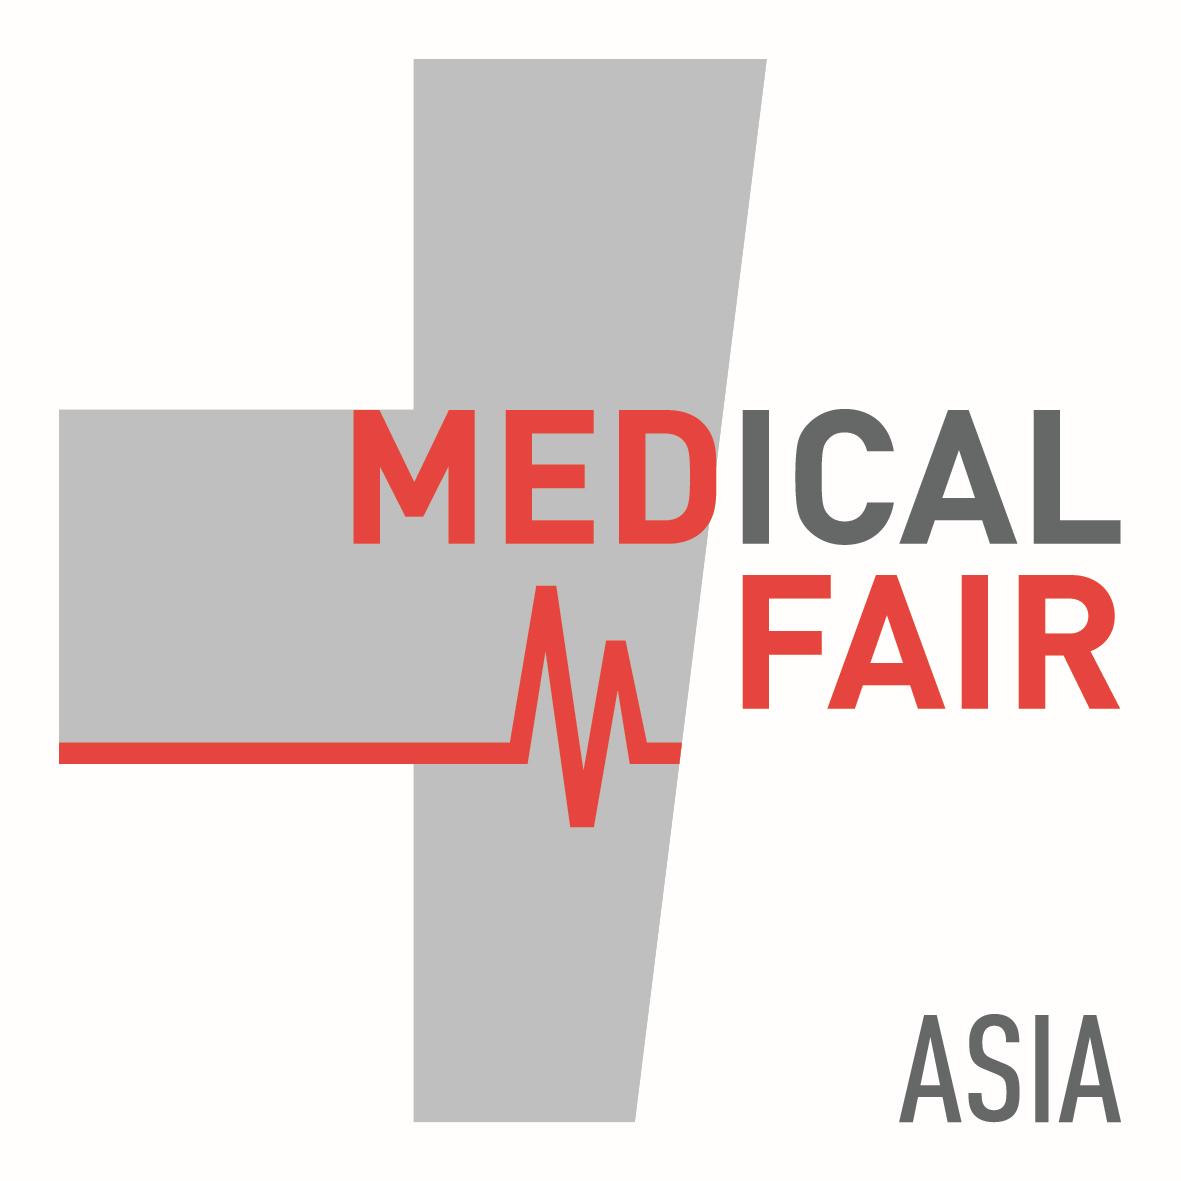 MEDICAL FAIR ASIA Logo